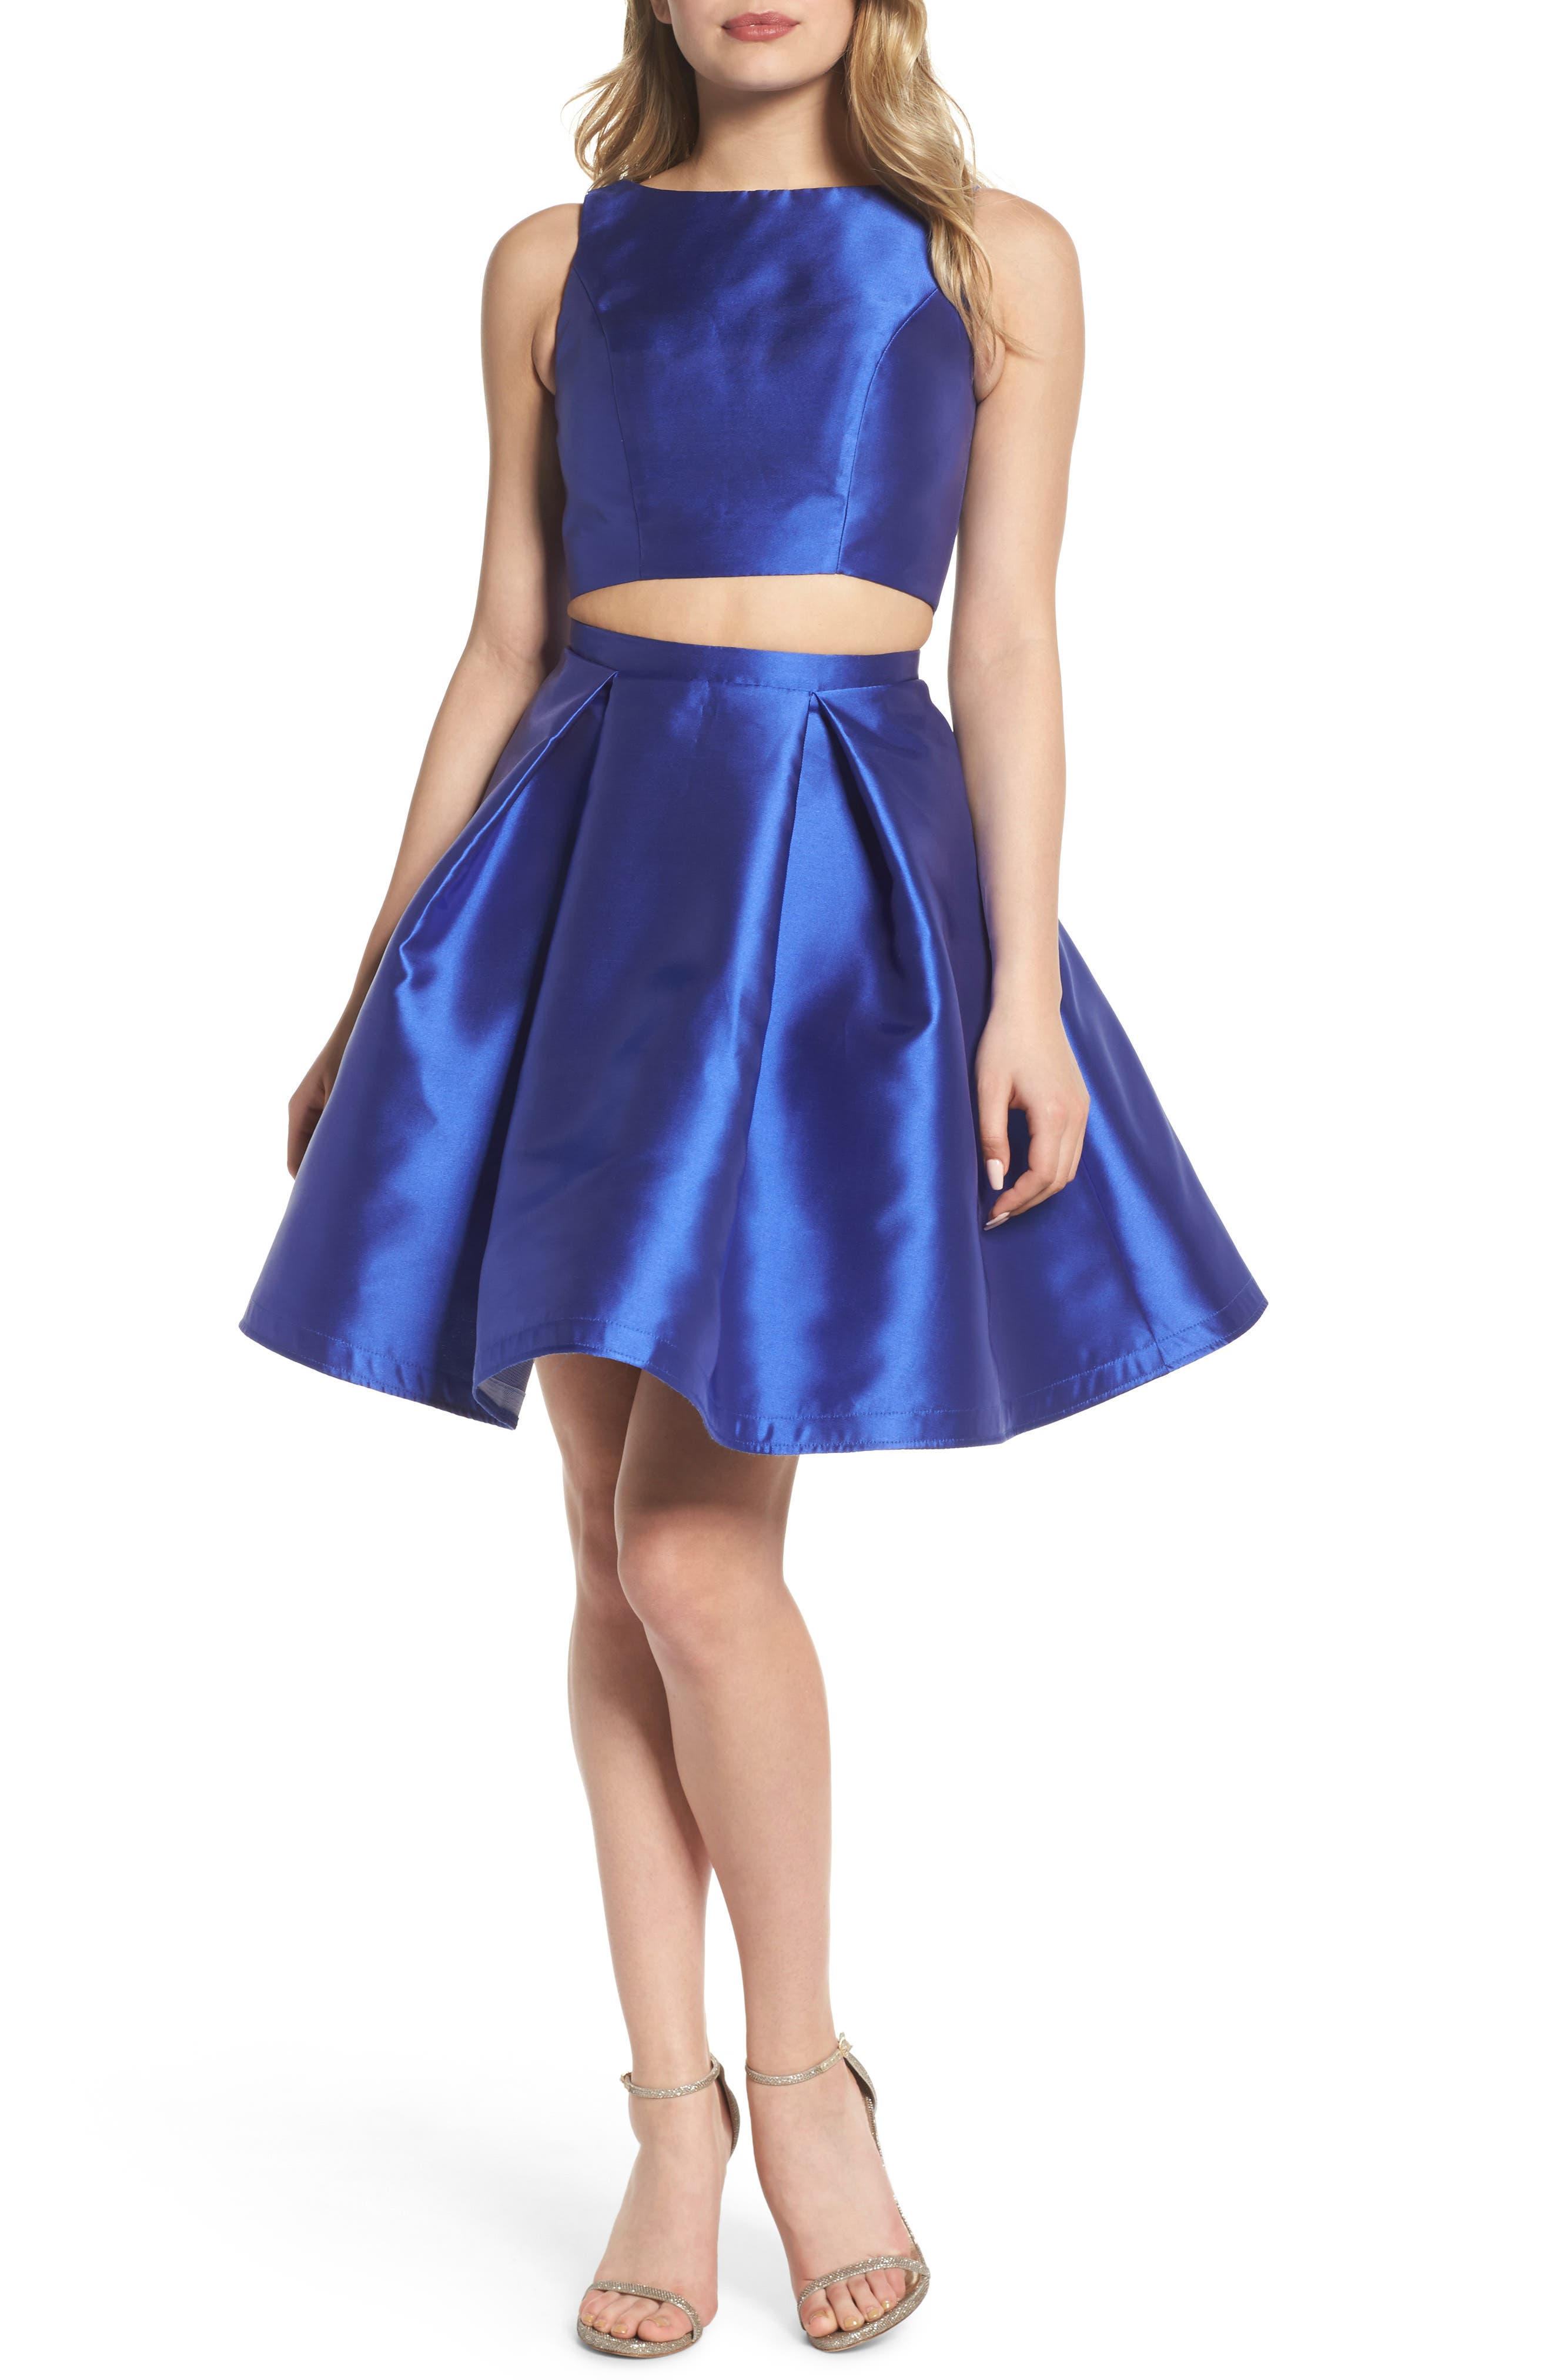 Skater Skirt Two-Piece Dress,                         Main,                         color, Sapphire